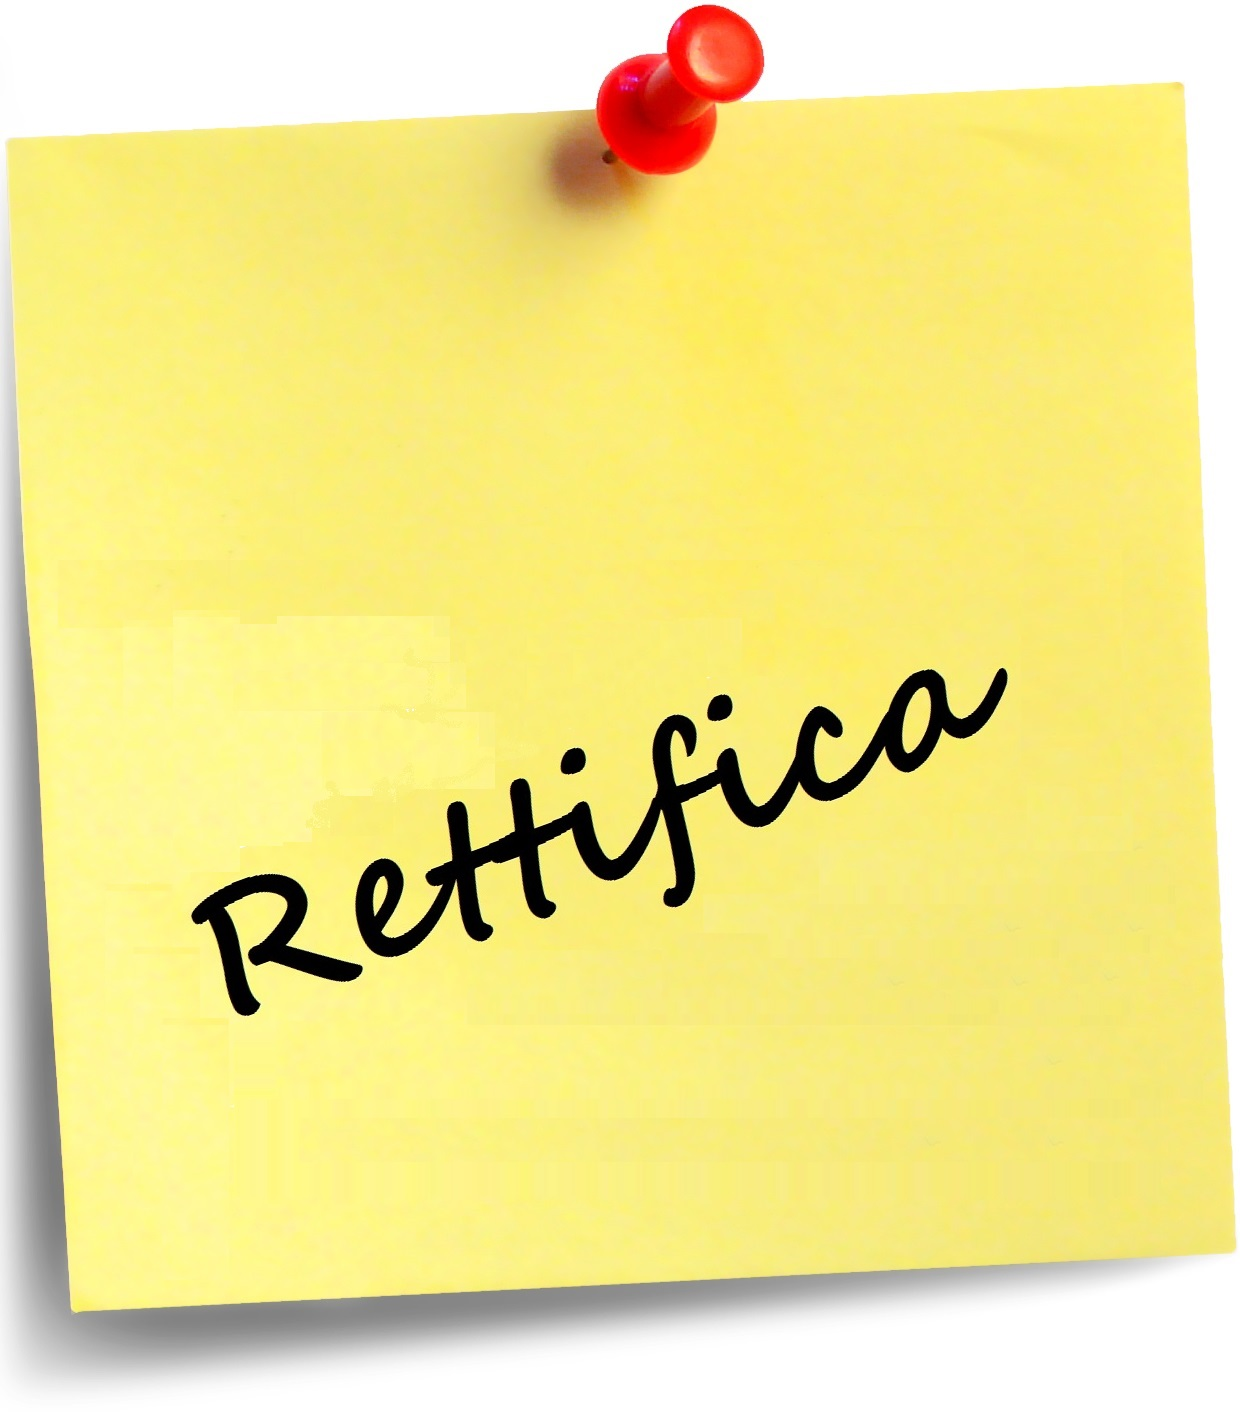 post-it-rettifica